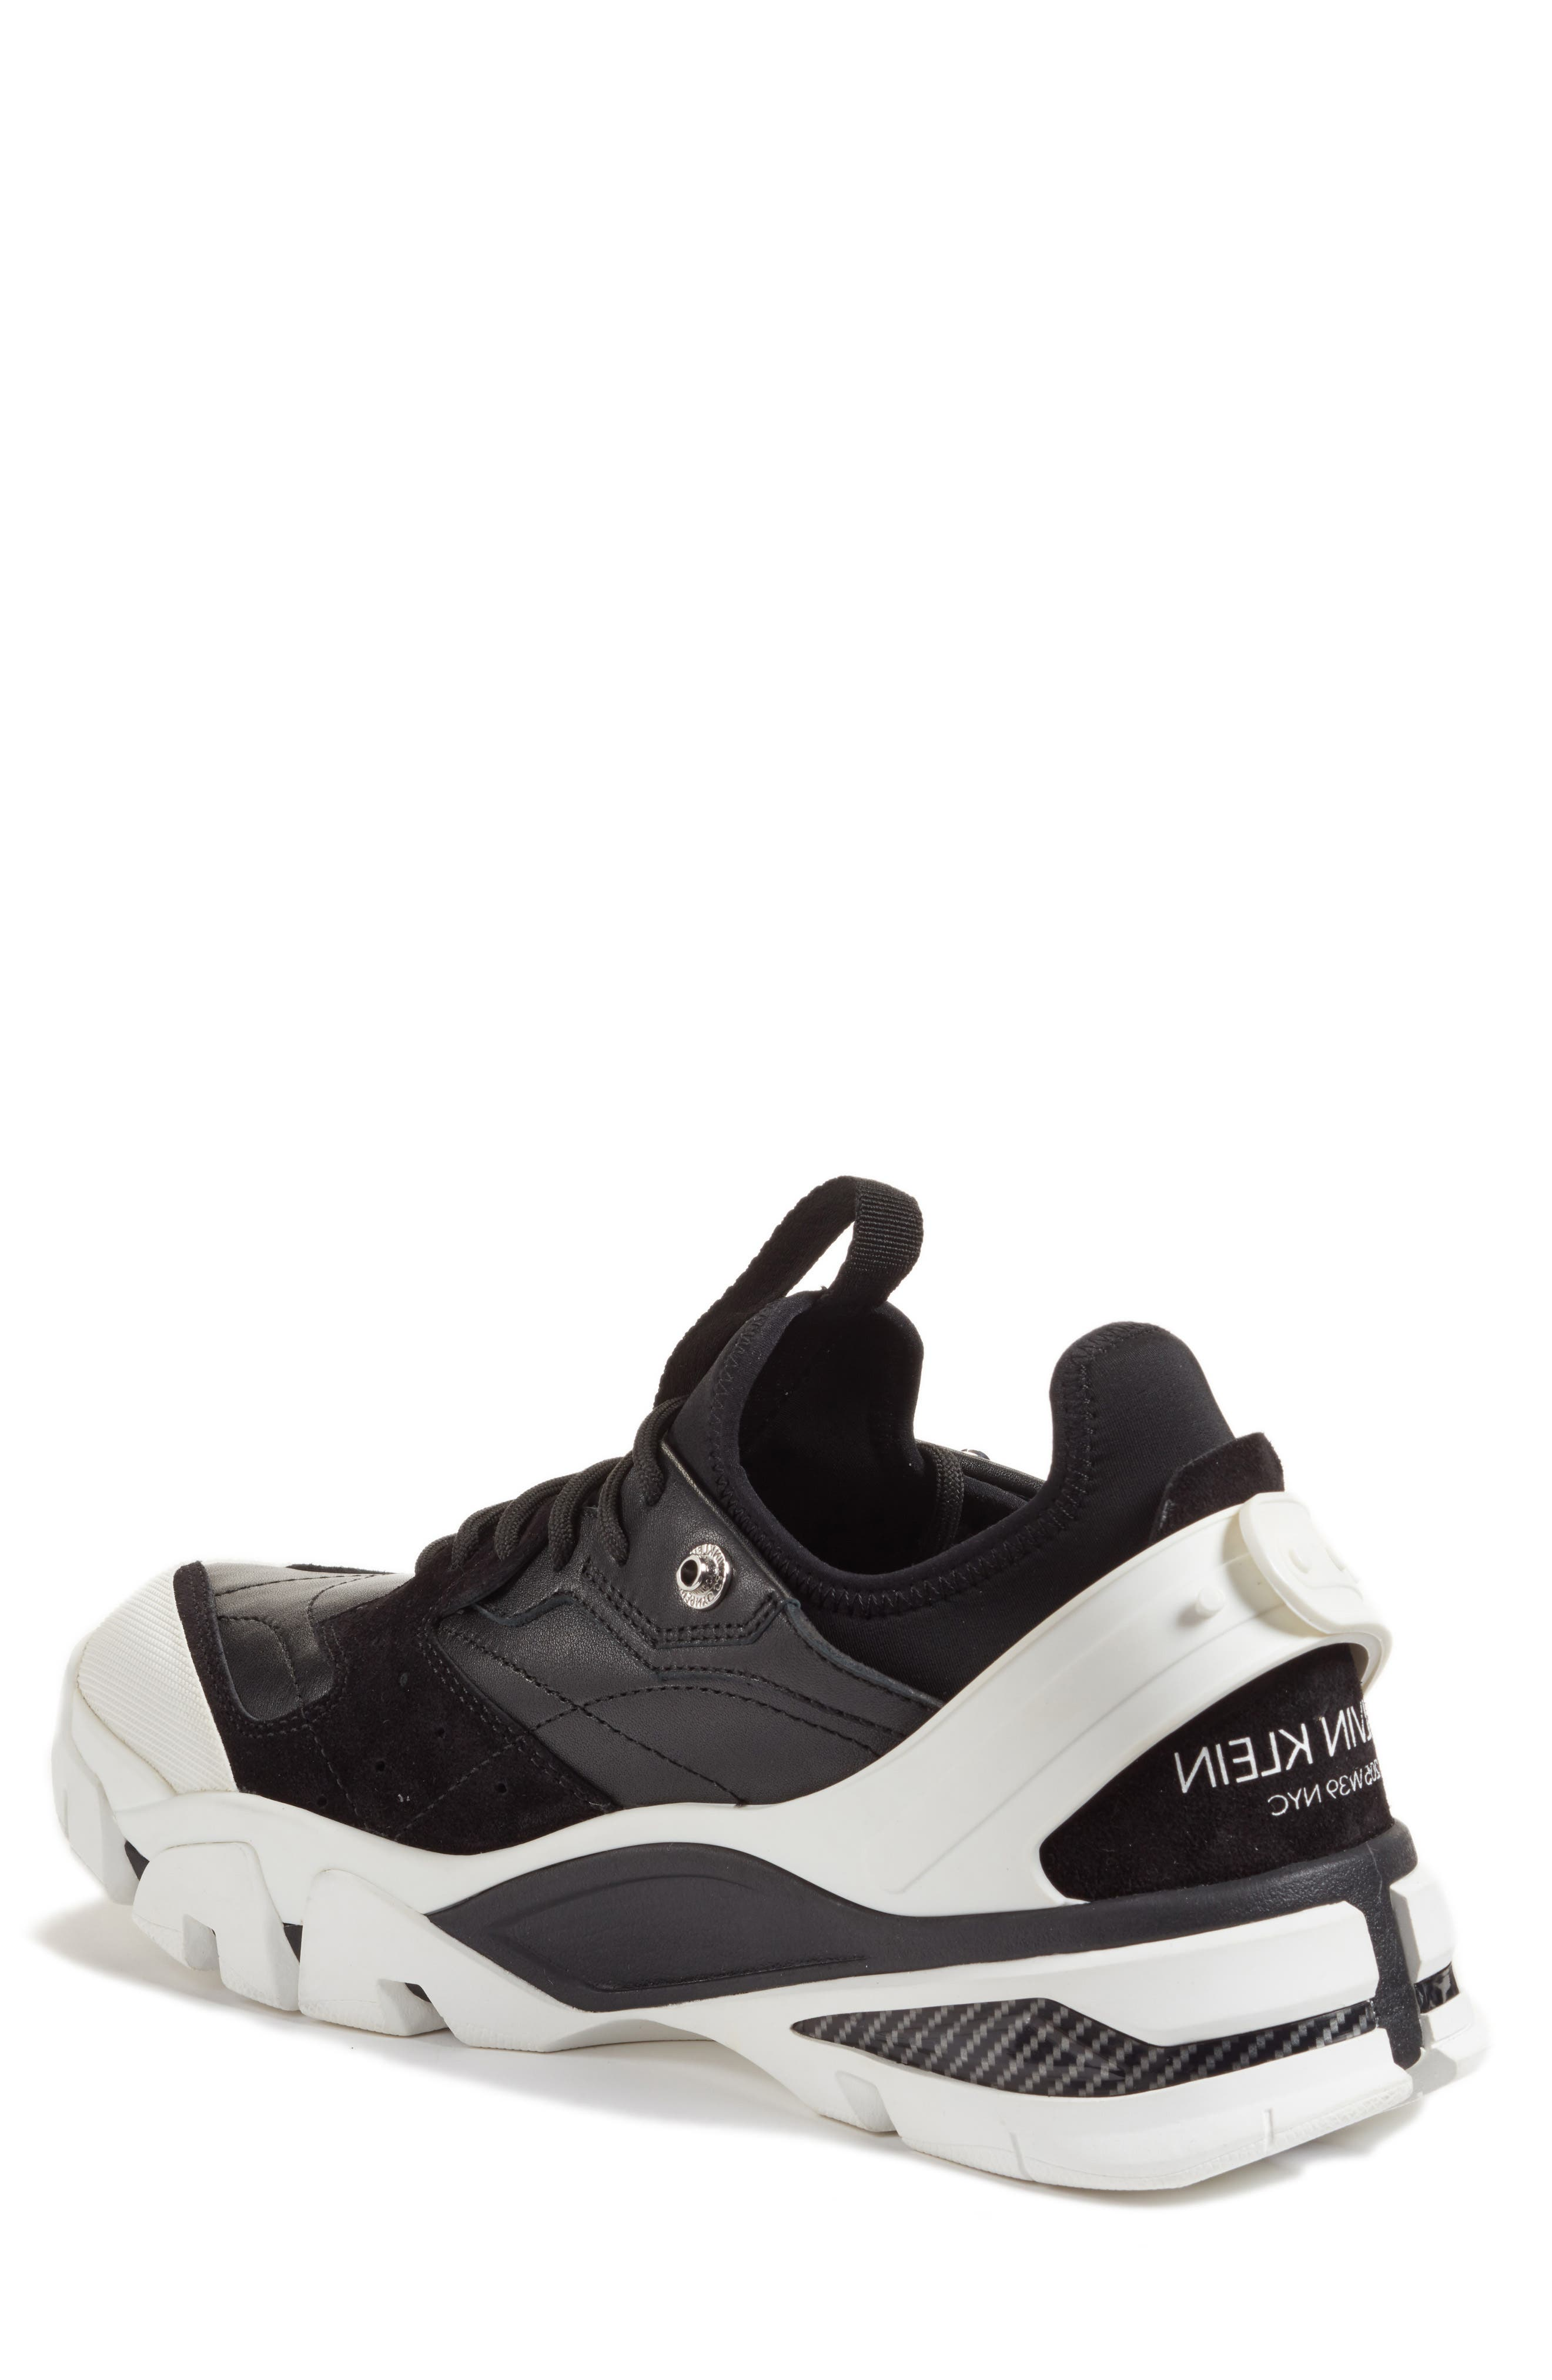 205W39NYC Carla Sneaker,                             Alternate thumbnail 2, color,                             WHITE/ BLACK